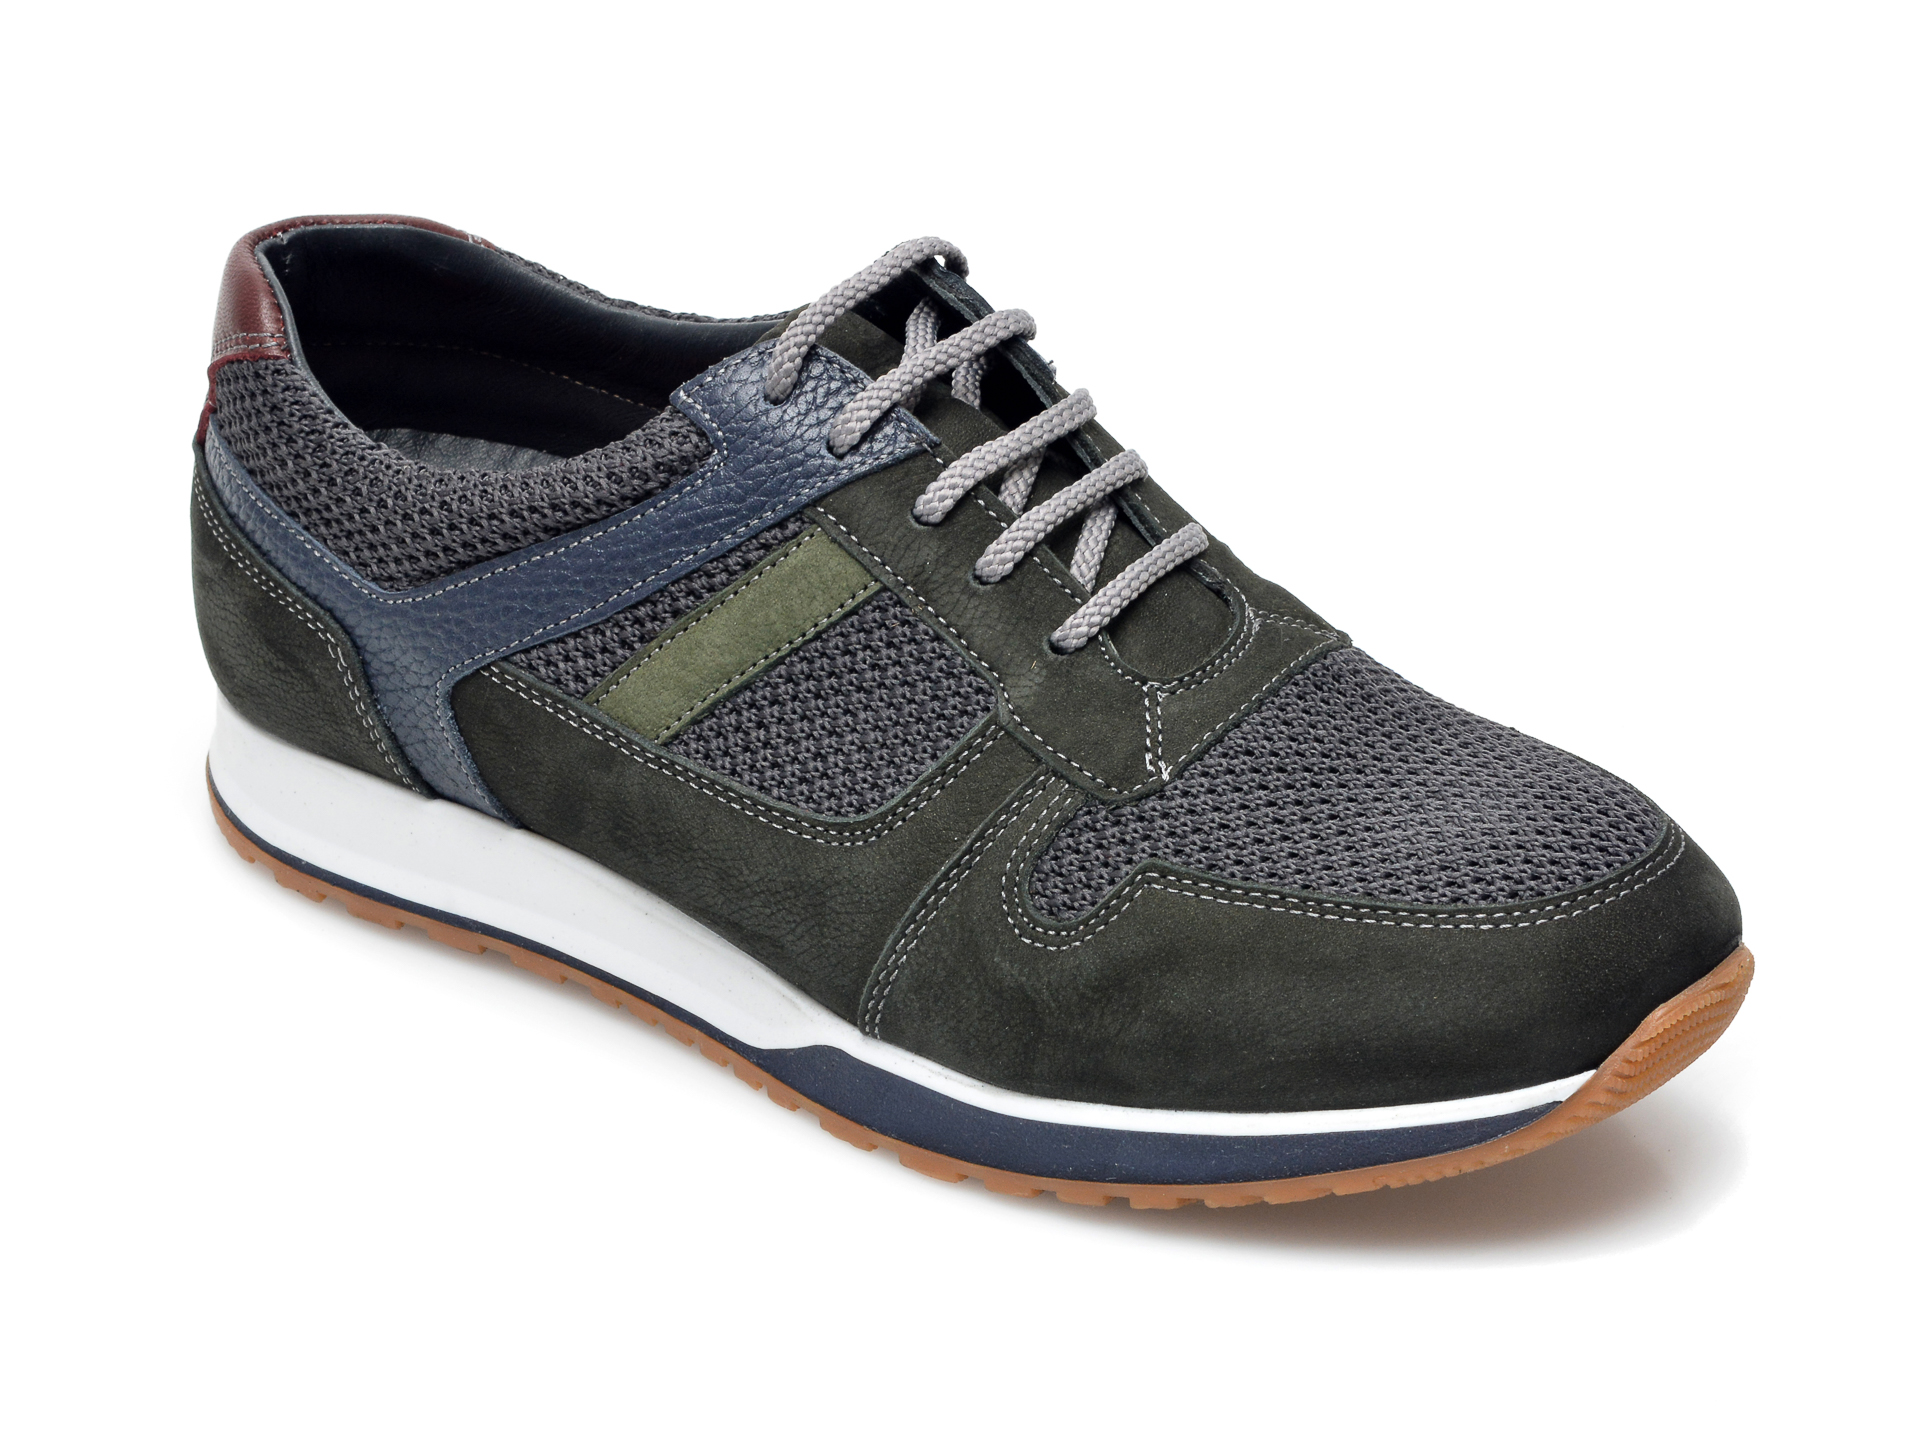 Pantofi sport OTTER verzi, 81101, din material textil si piele intoarsa imagine